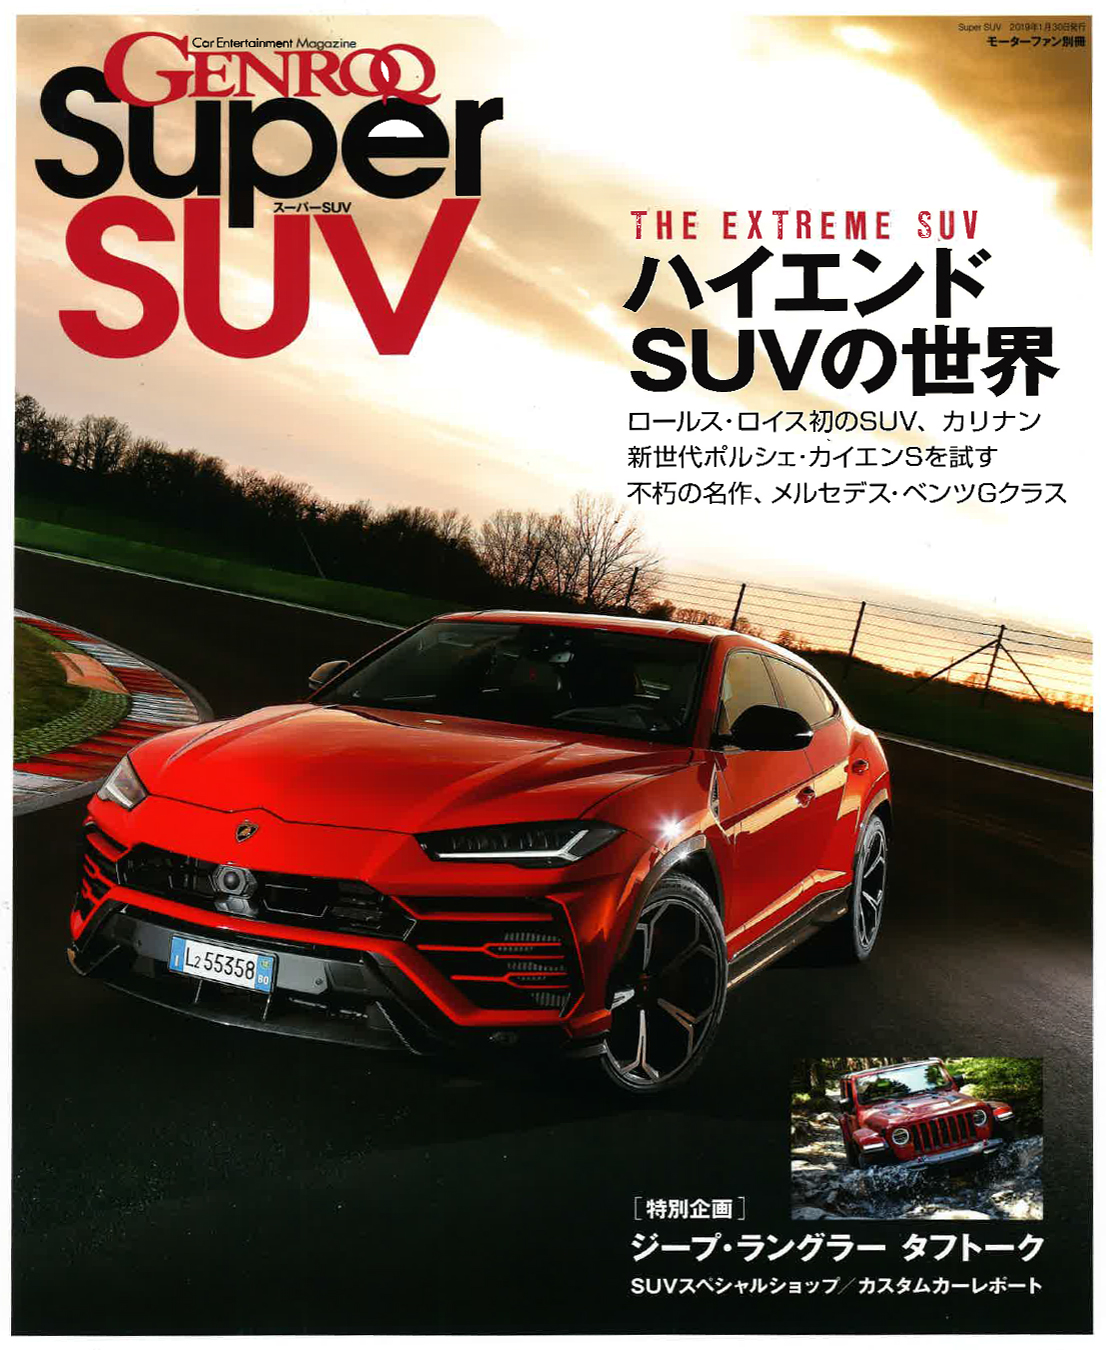 GENROQ Super SUV 2019年1月号表紙